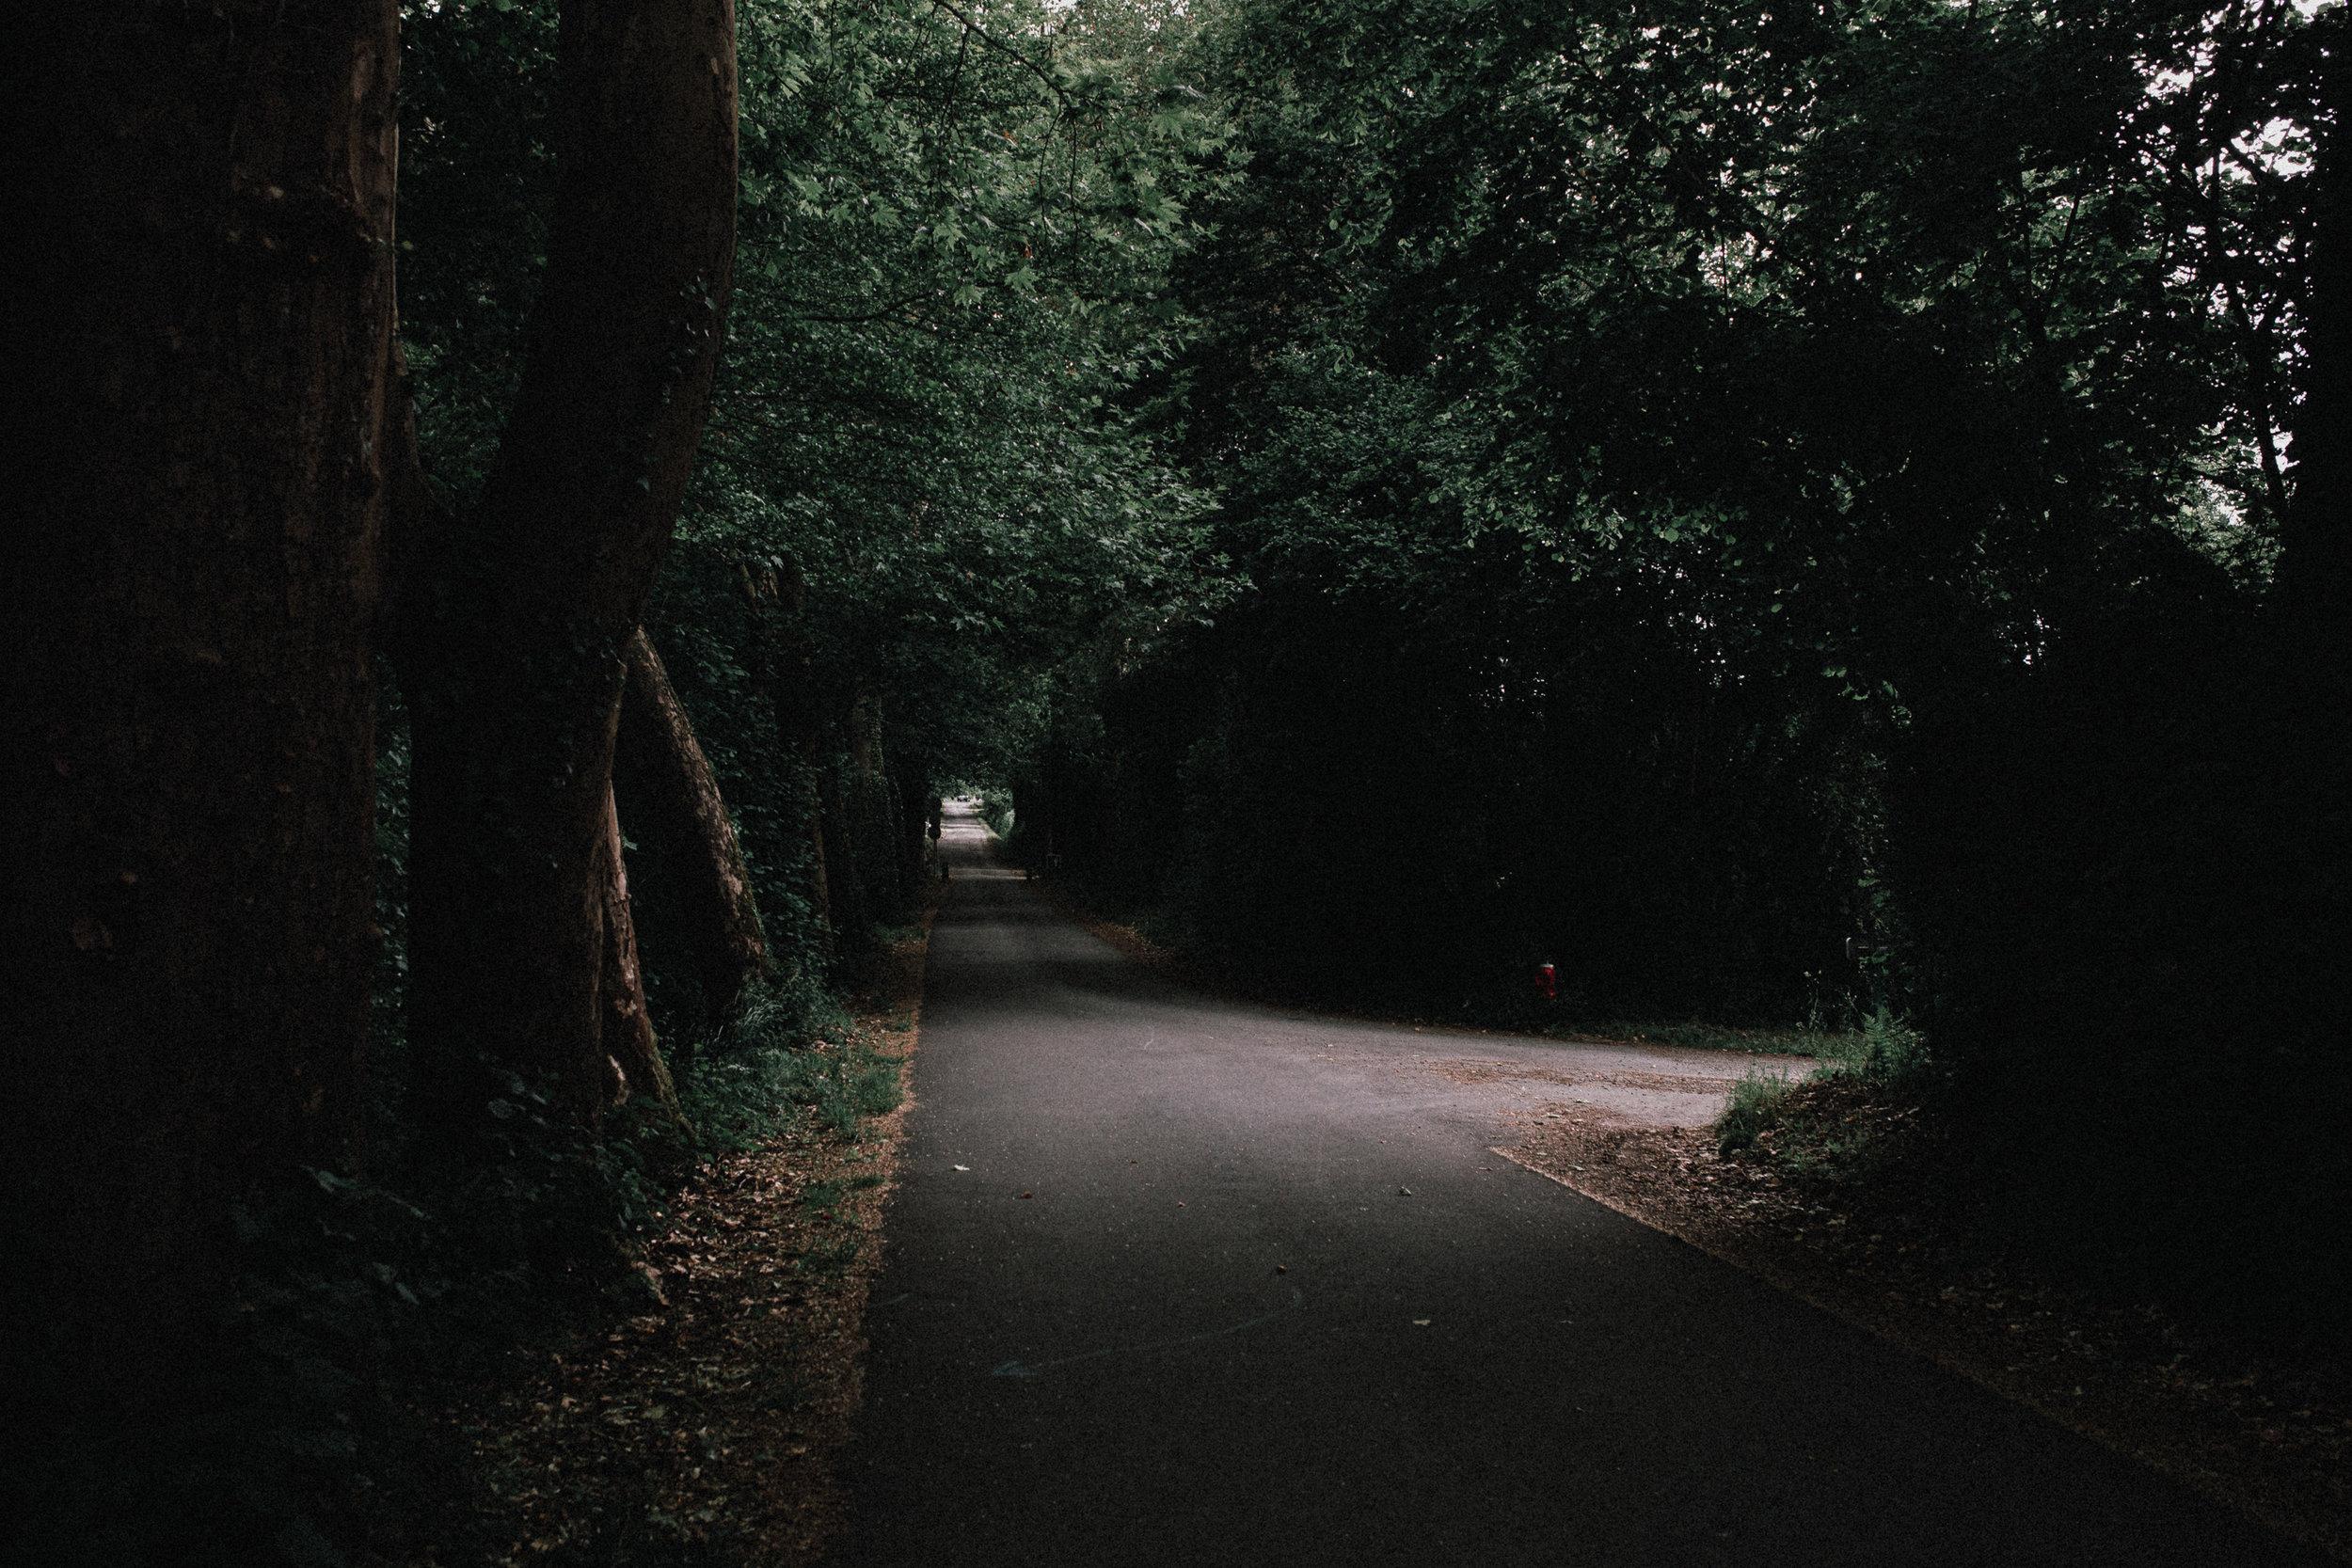 Jeu. 06 Juin 2019 - Balade dans la nature